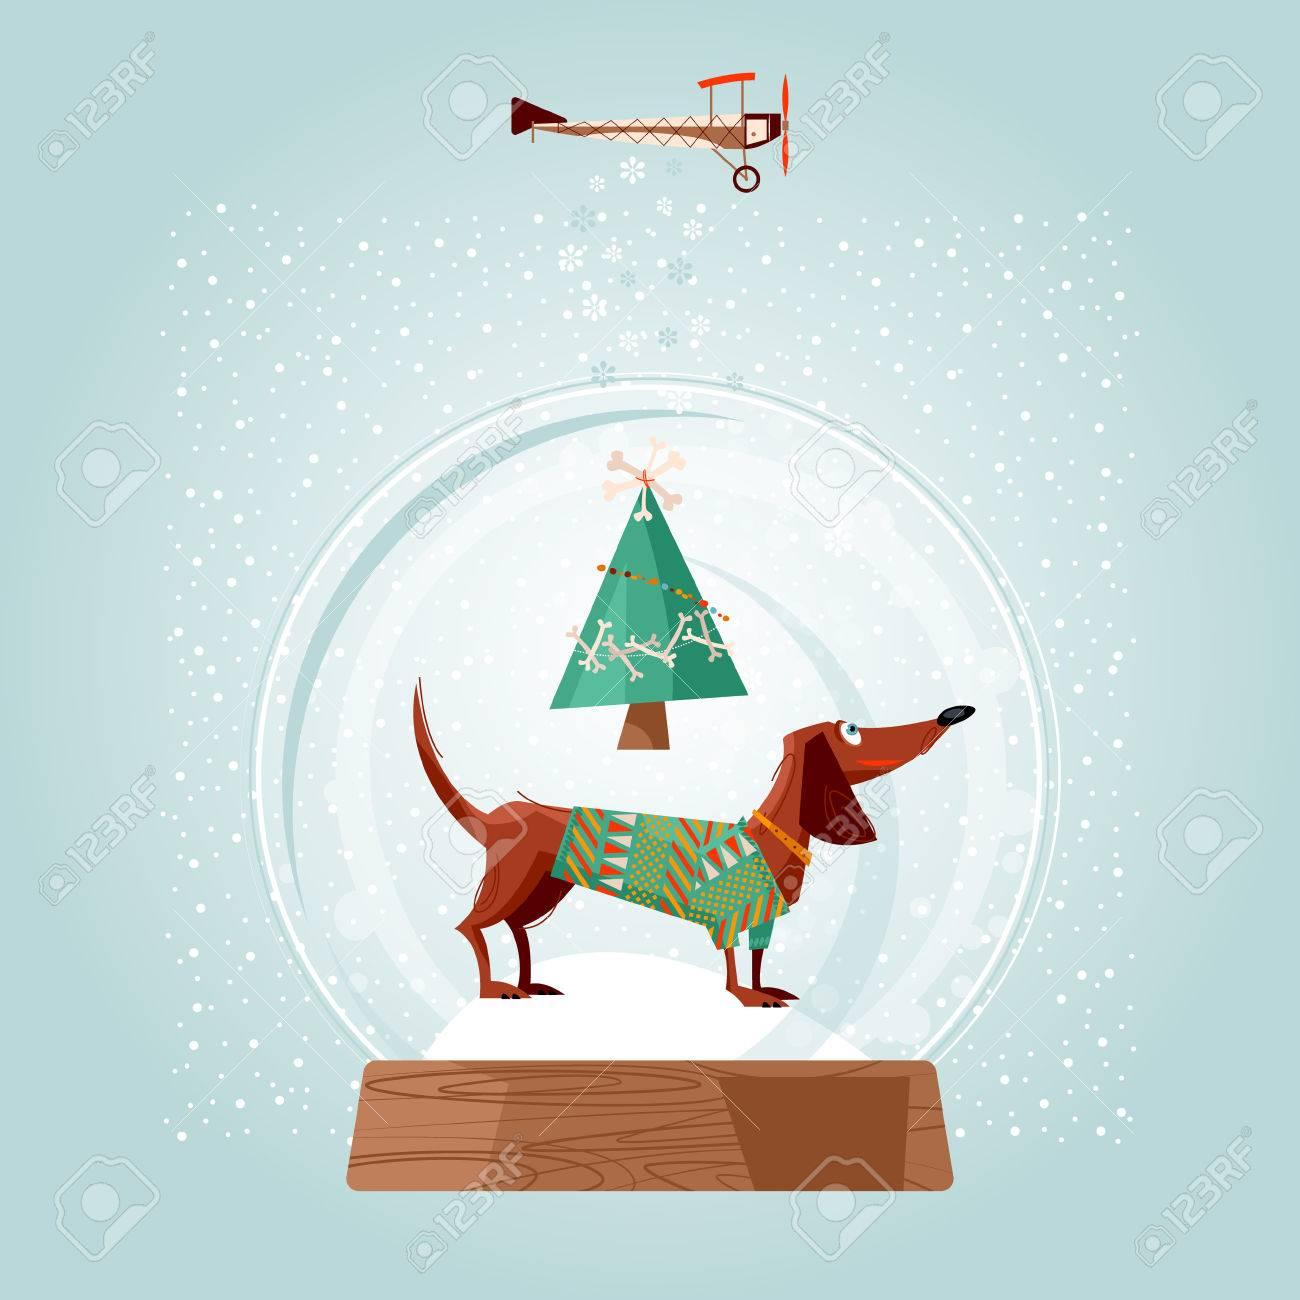 Christmas snow globe and dachshund christmas dog greeting card christmas snow globe and dachshund christmas dog greeting card illustration stock vector kristyandbryce Image collections